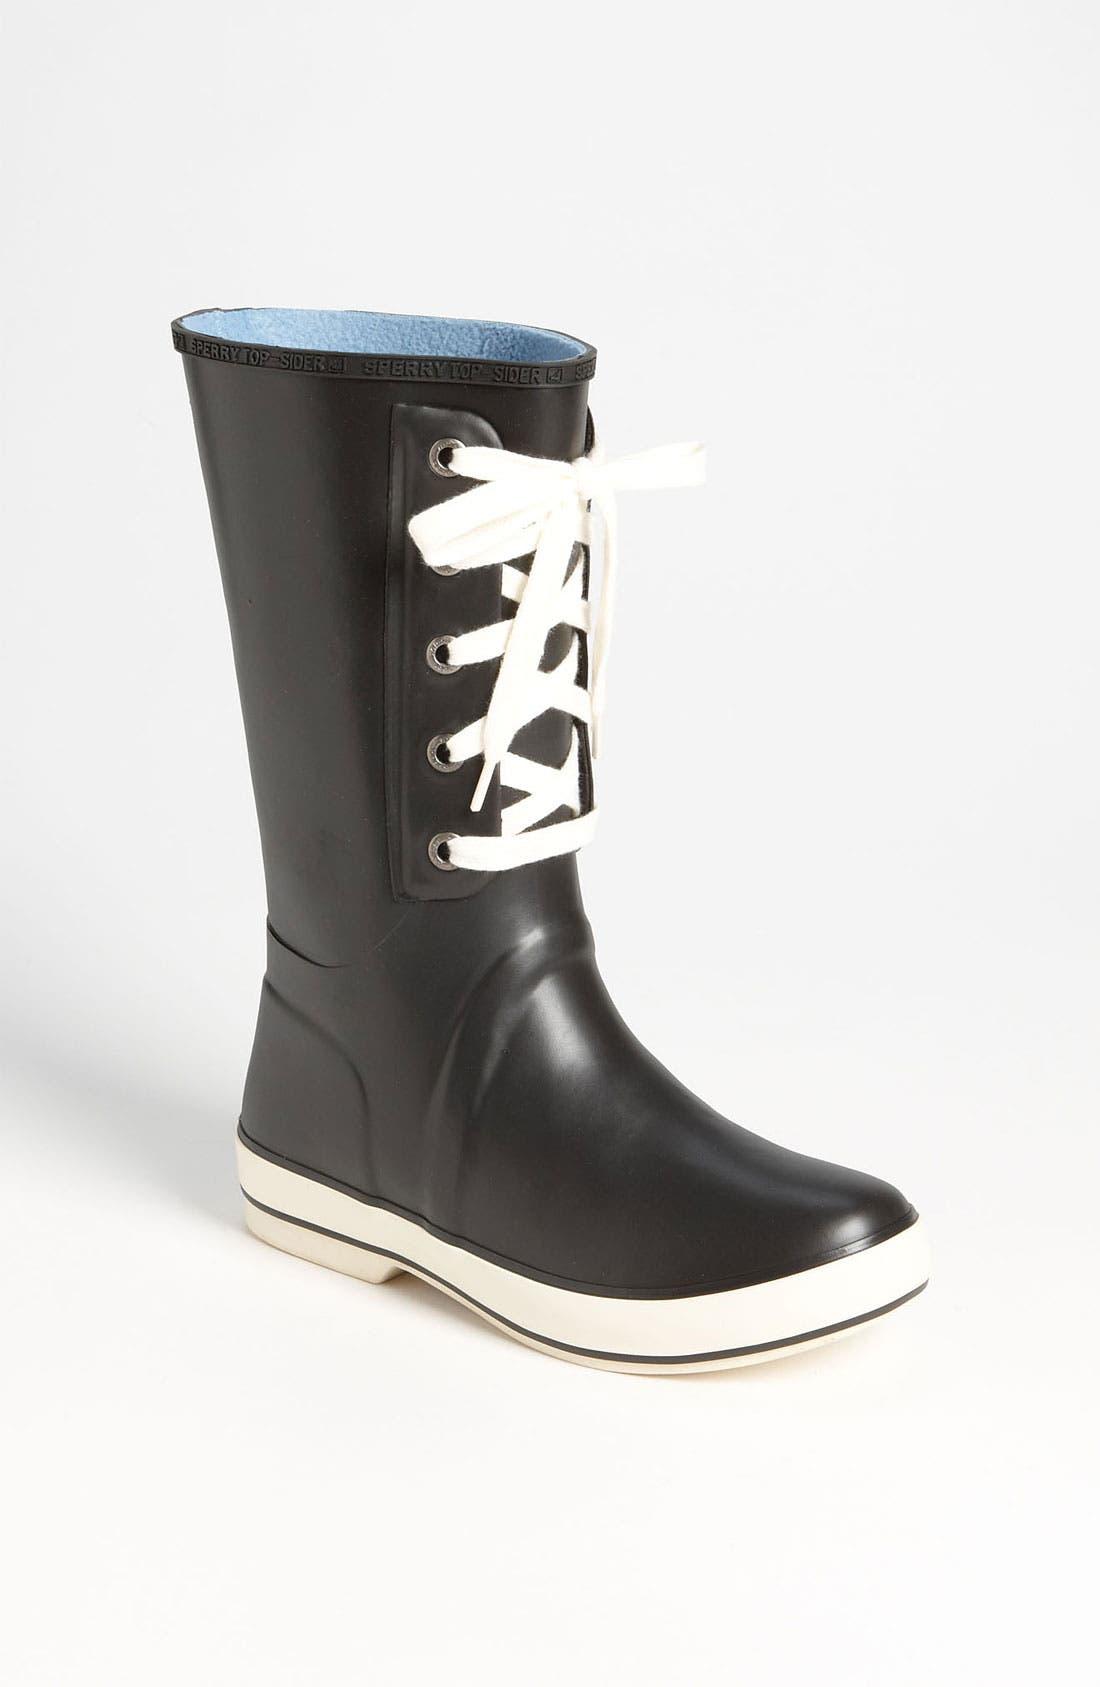 Alternate Image 1 Selected - Sperry Top-Sider® 'Rain Storm' Rain Boot (Women) (Online Exclusive)